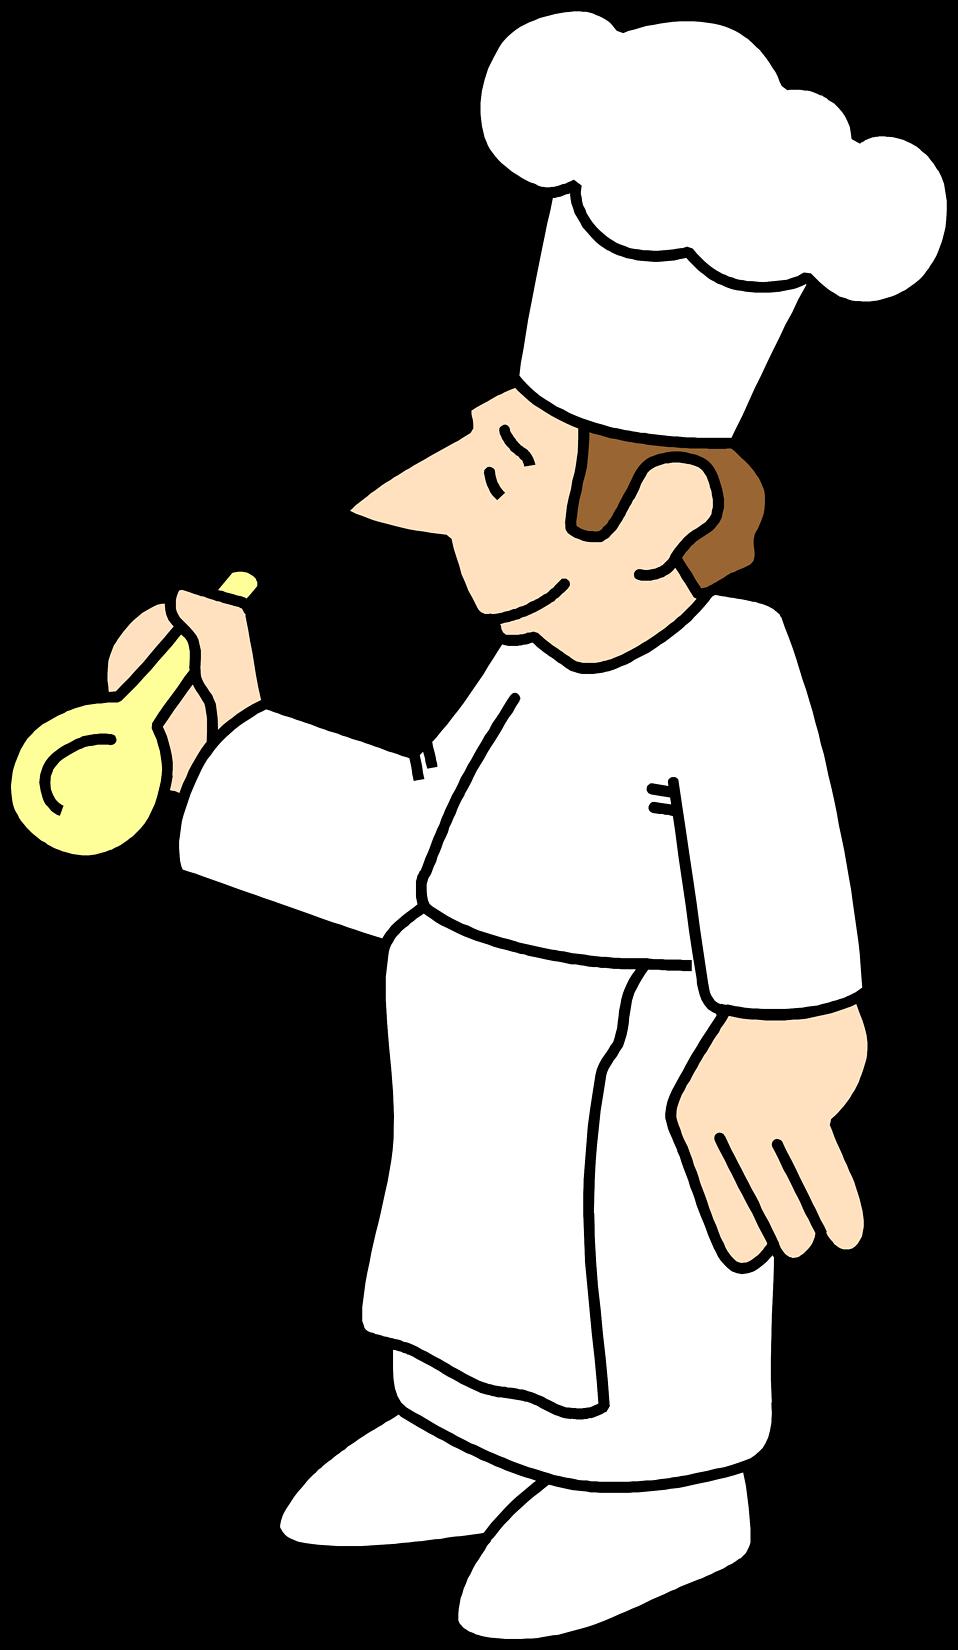 Free stock photo illustration. Glove clipart chef